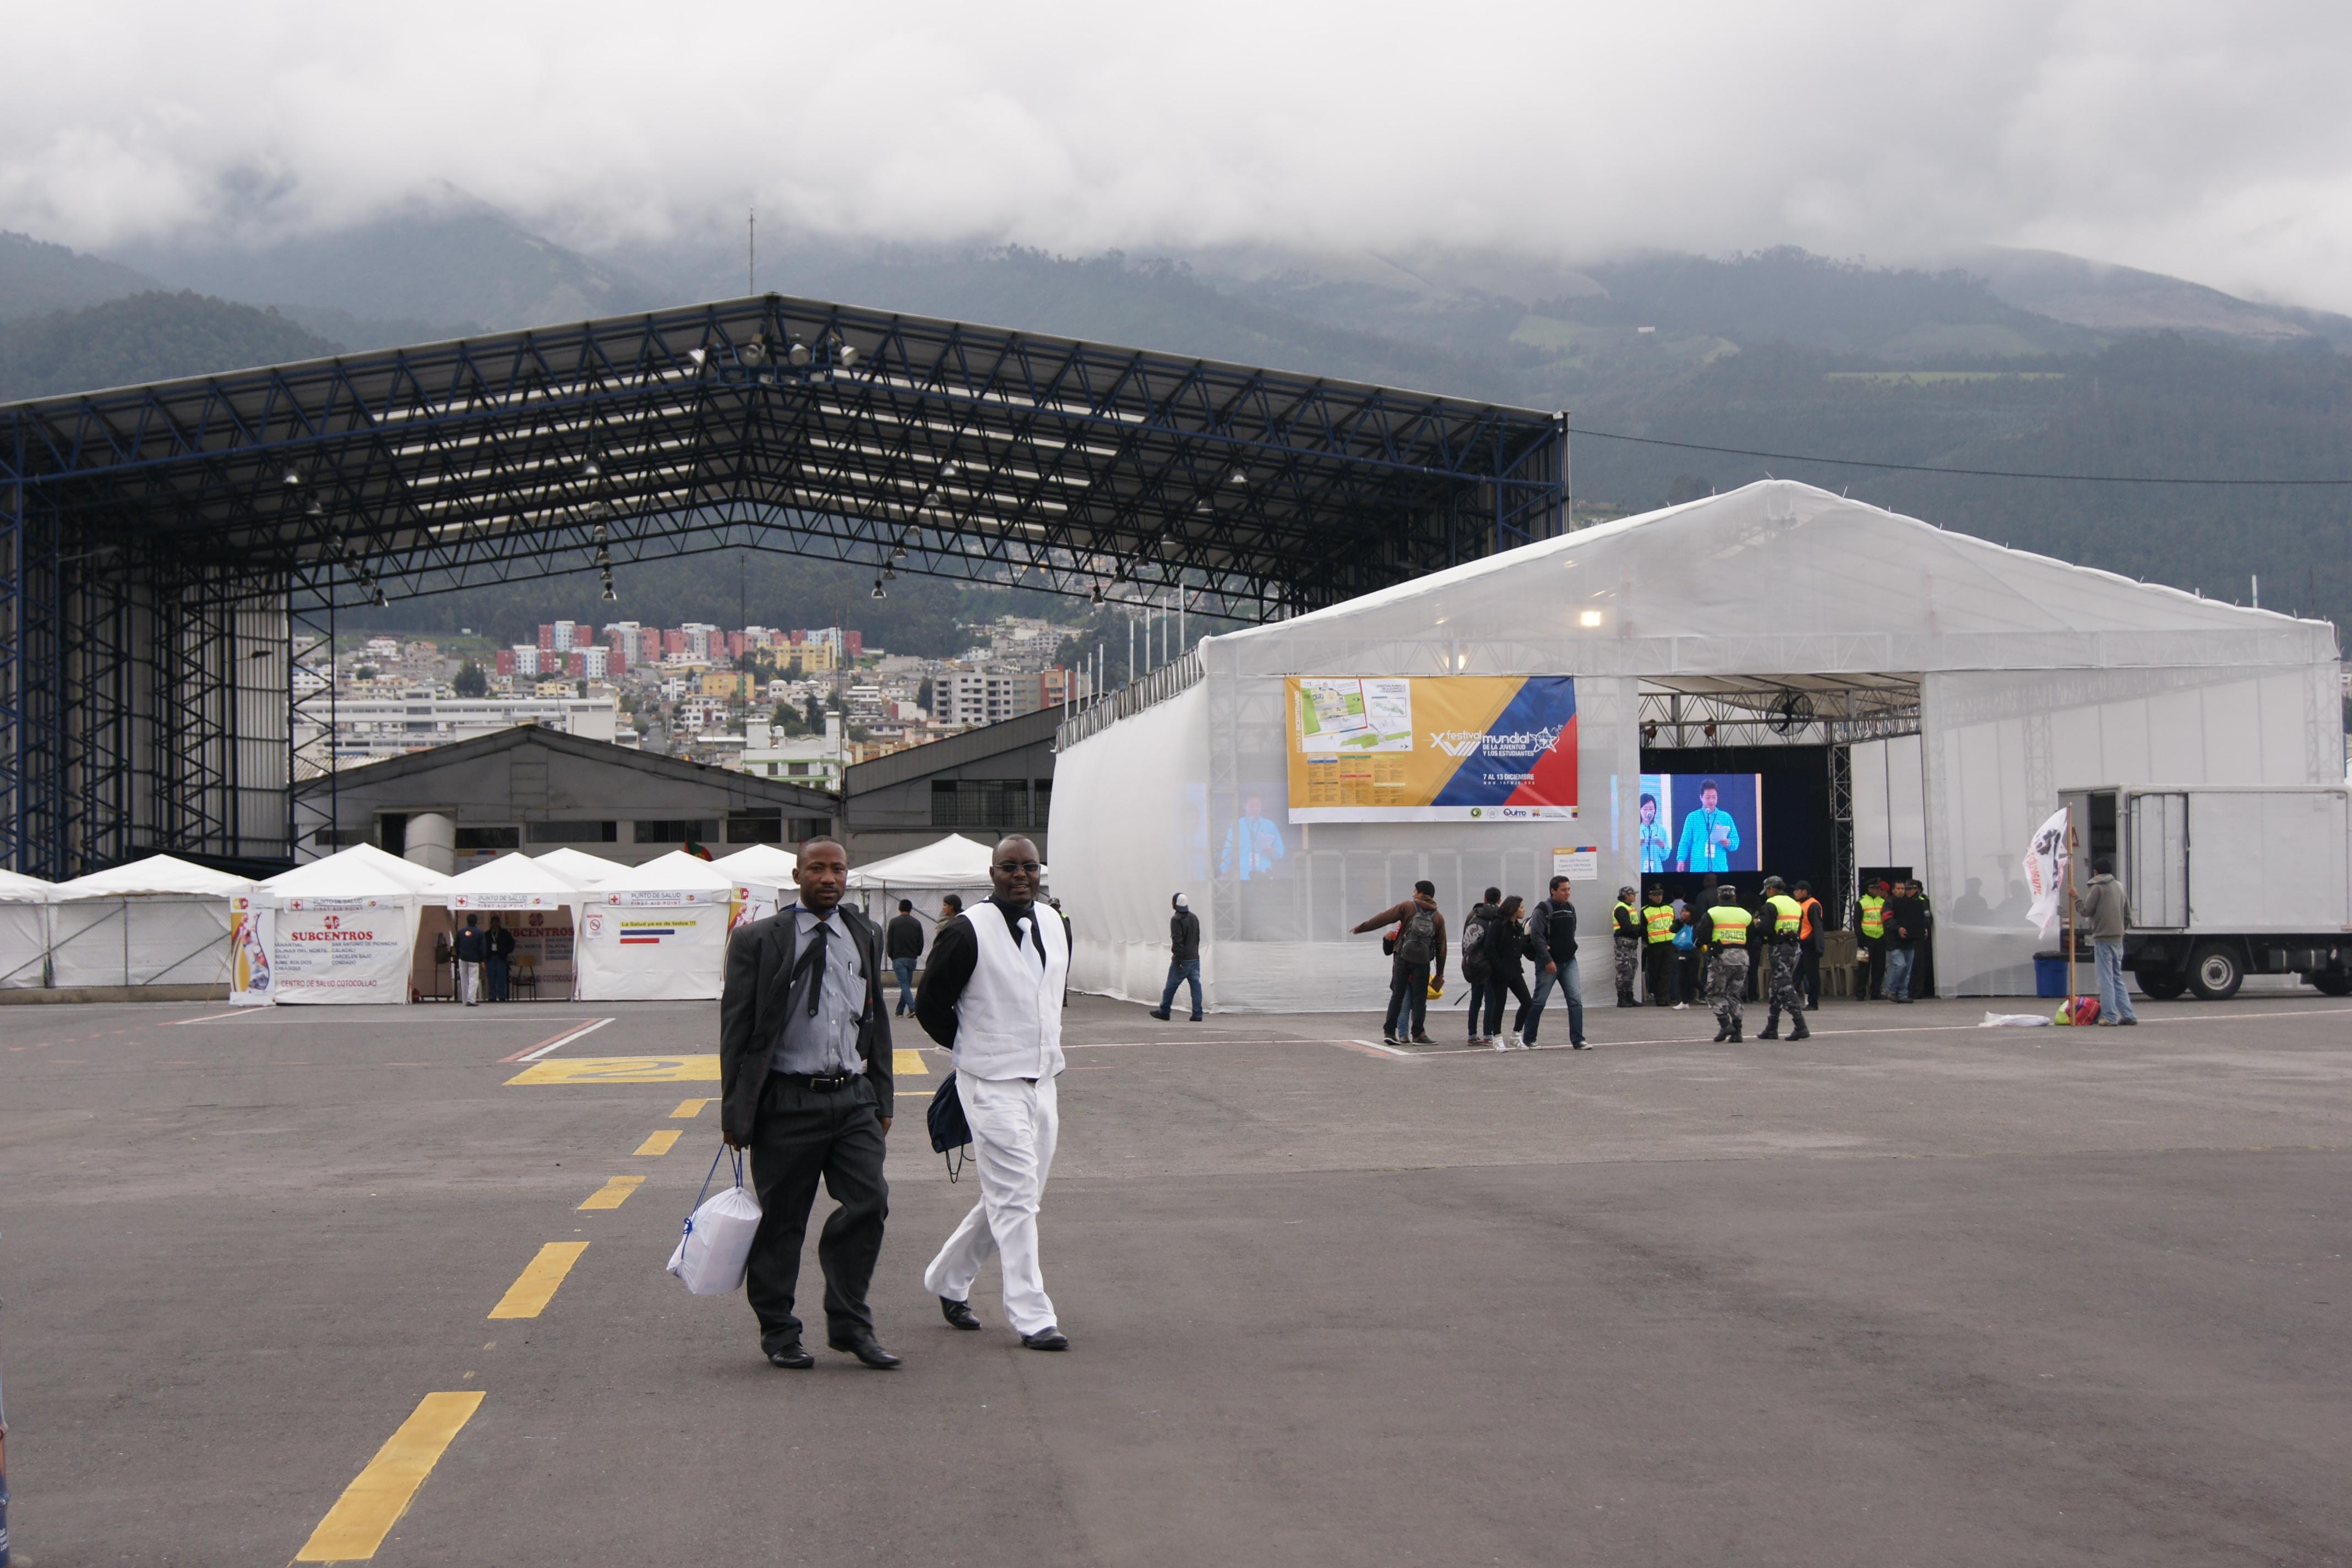 Tag 4: Weltfestspiele auf über 2800 Meter Höhe